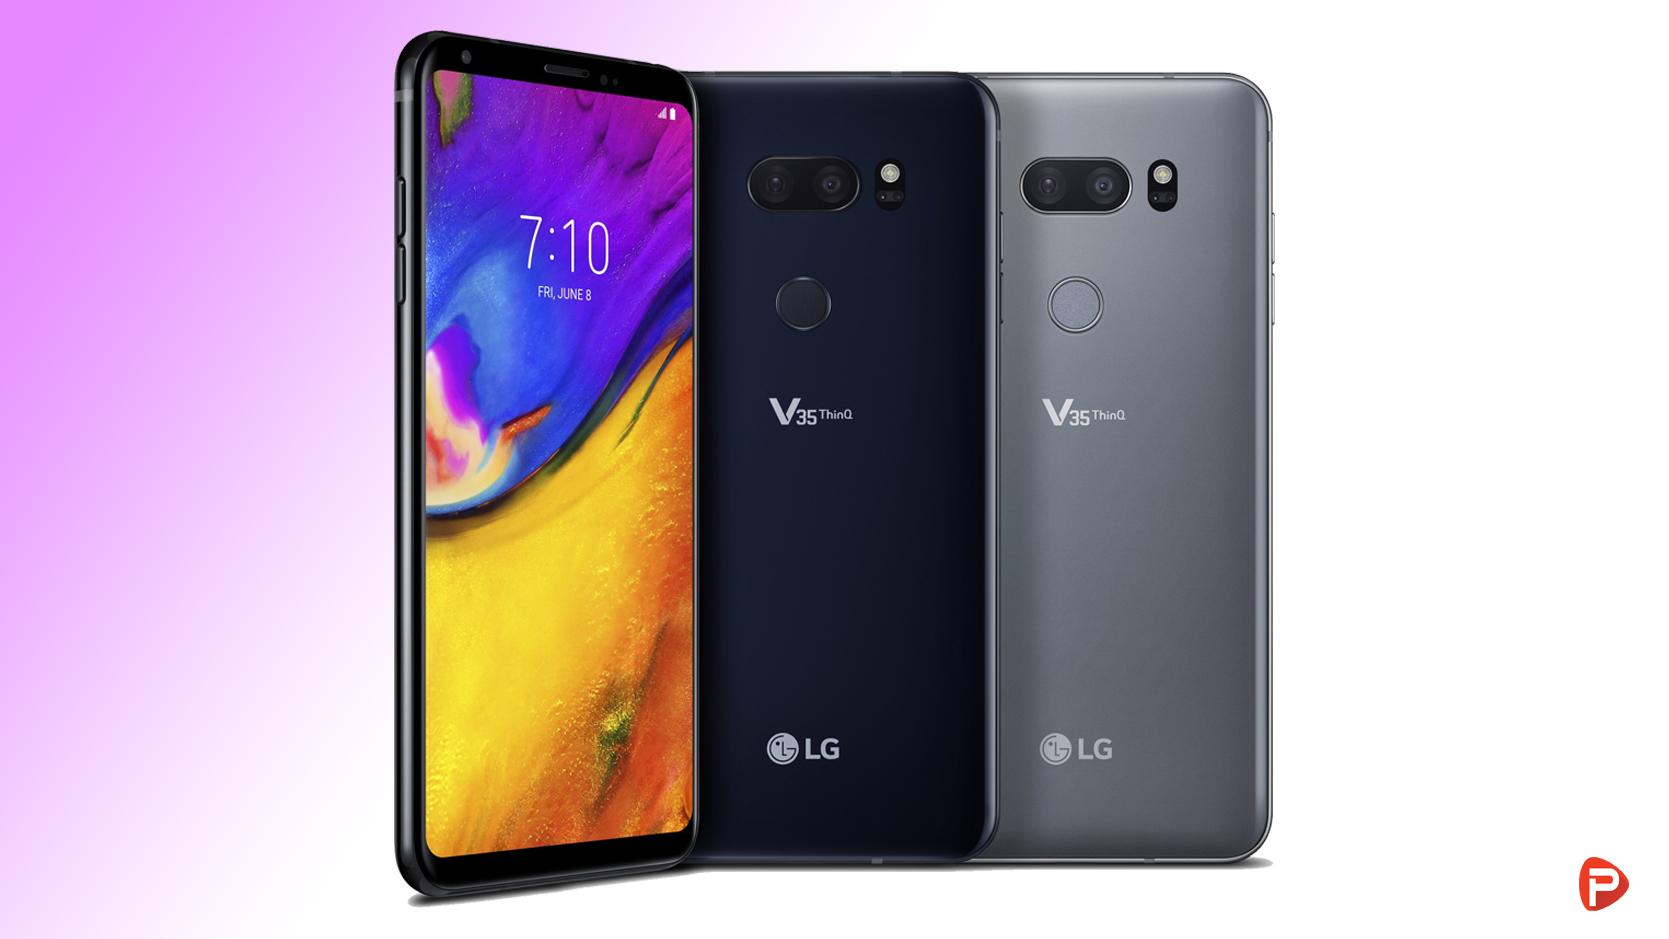 LG V35 ThinQ: an upgrade to G7 ThinQ